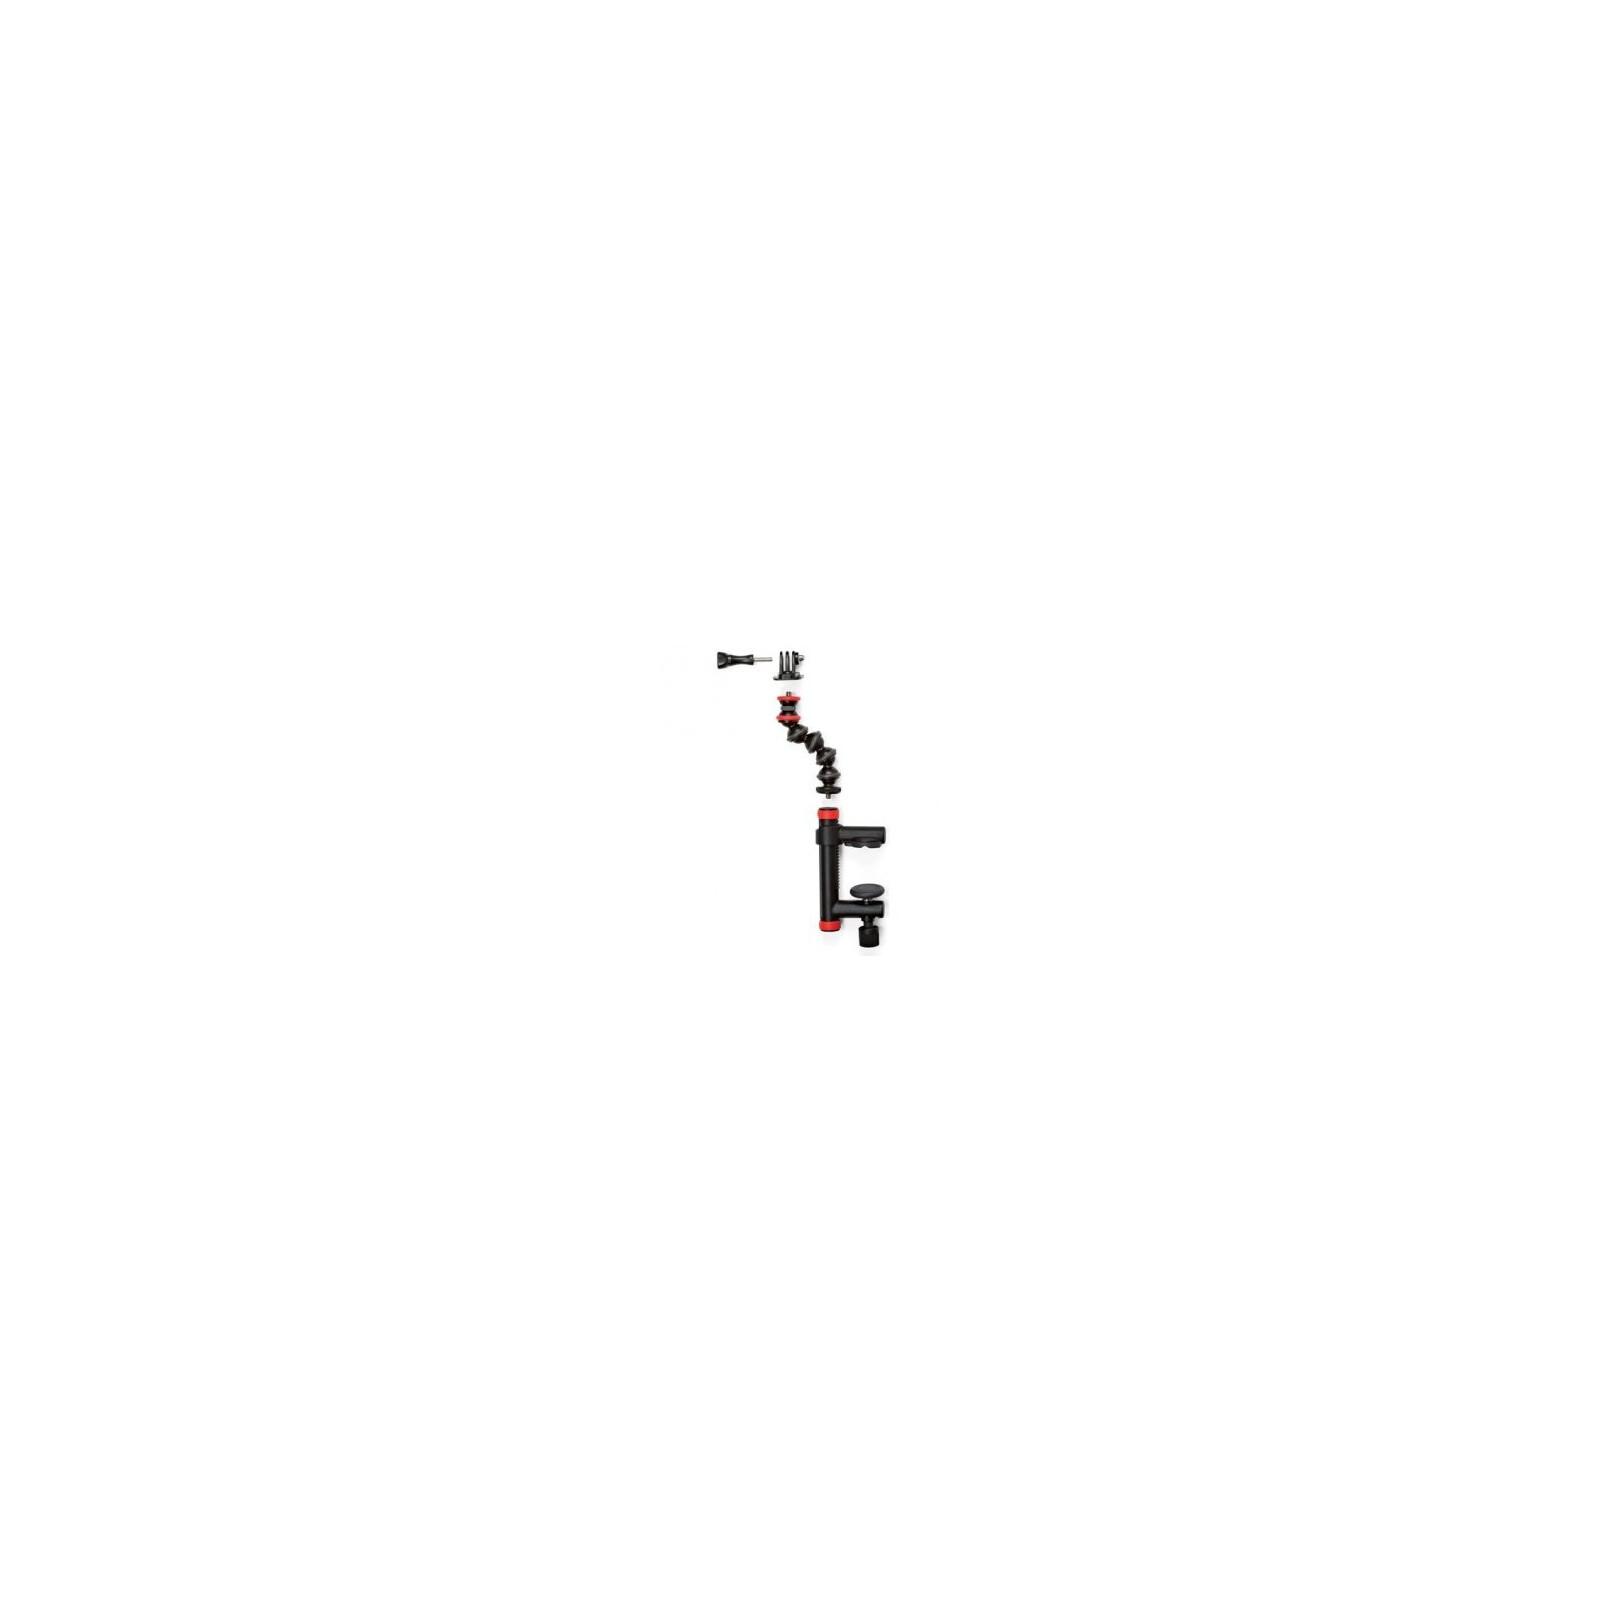 Joby Action Clamp & GorillaPod Arm f. GoPro